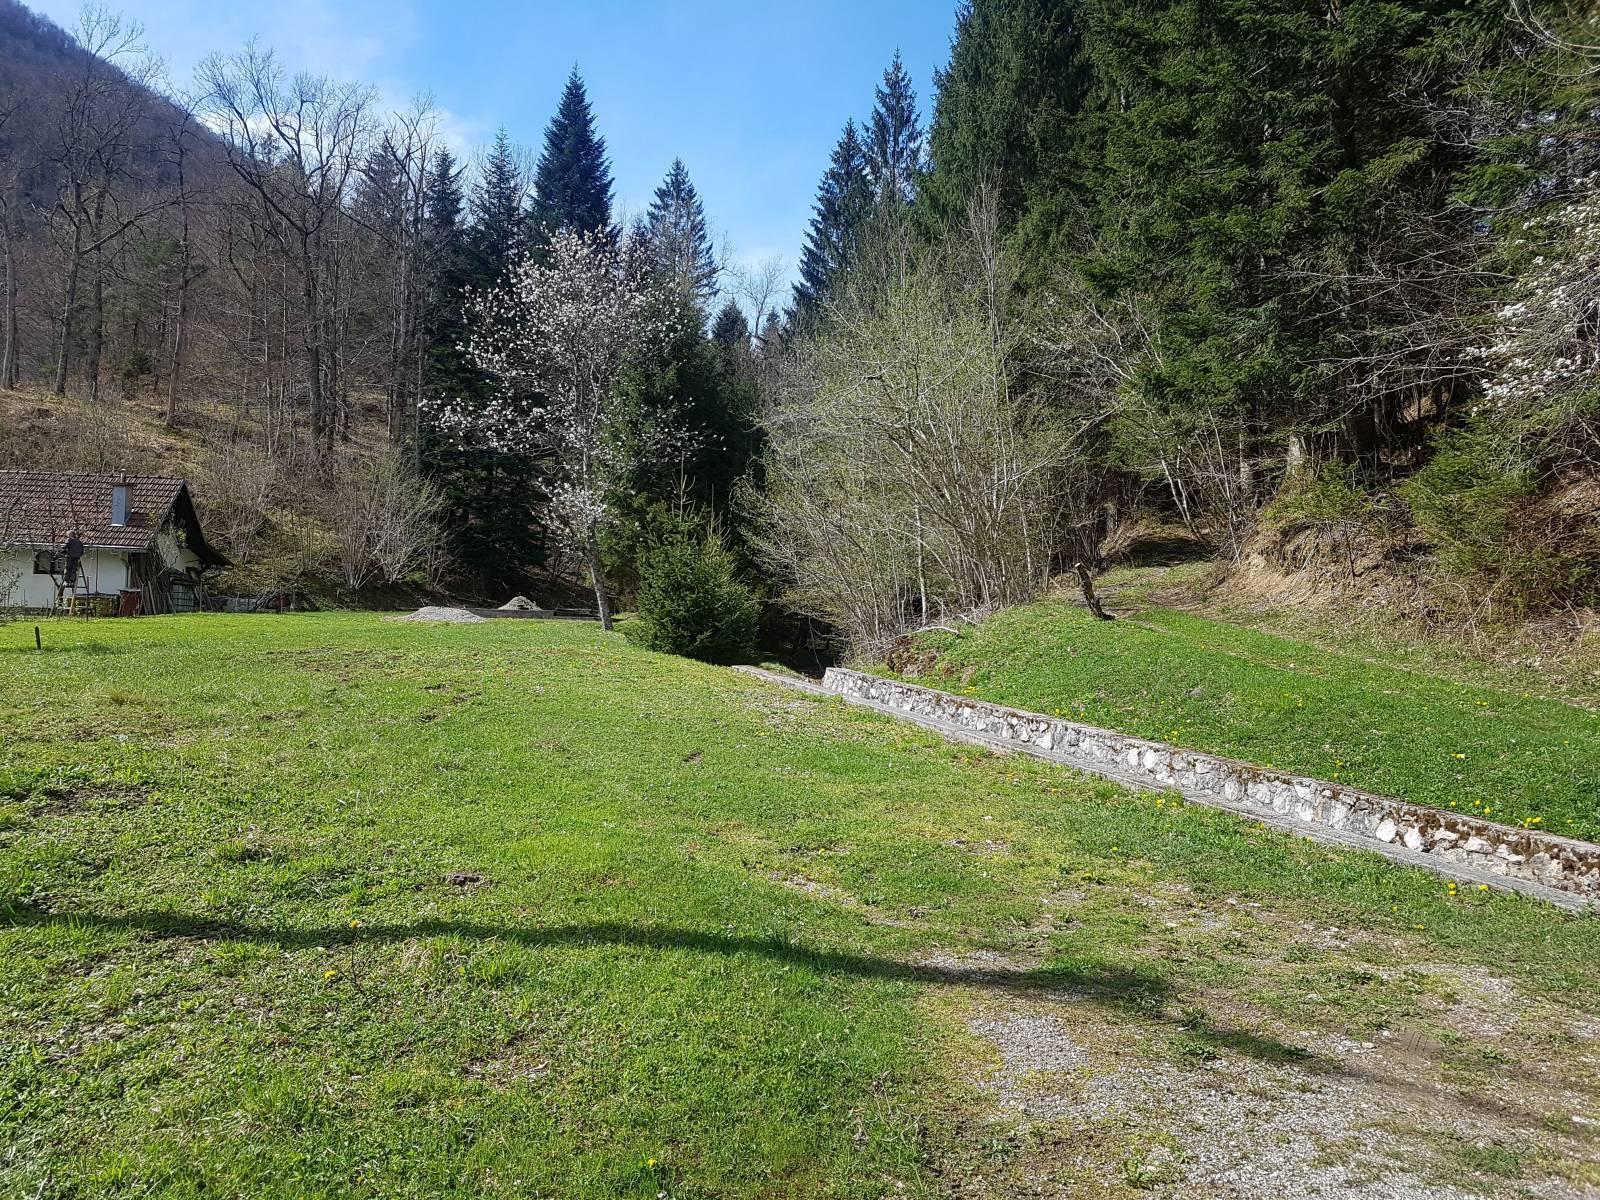 Grundstück Ševalj, Delnice, 708m2